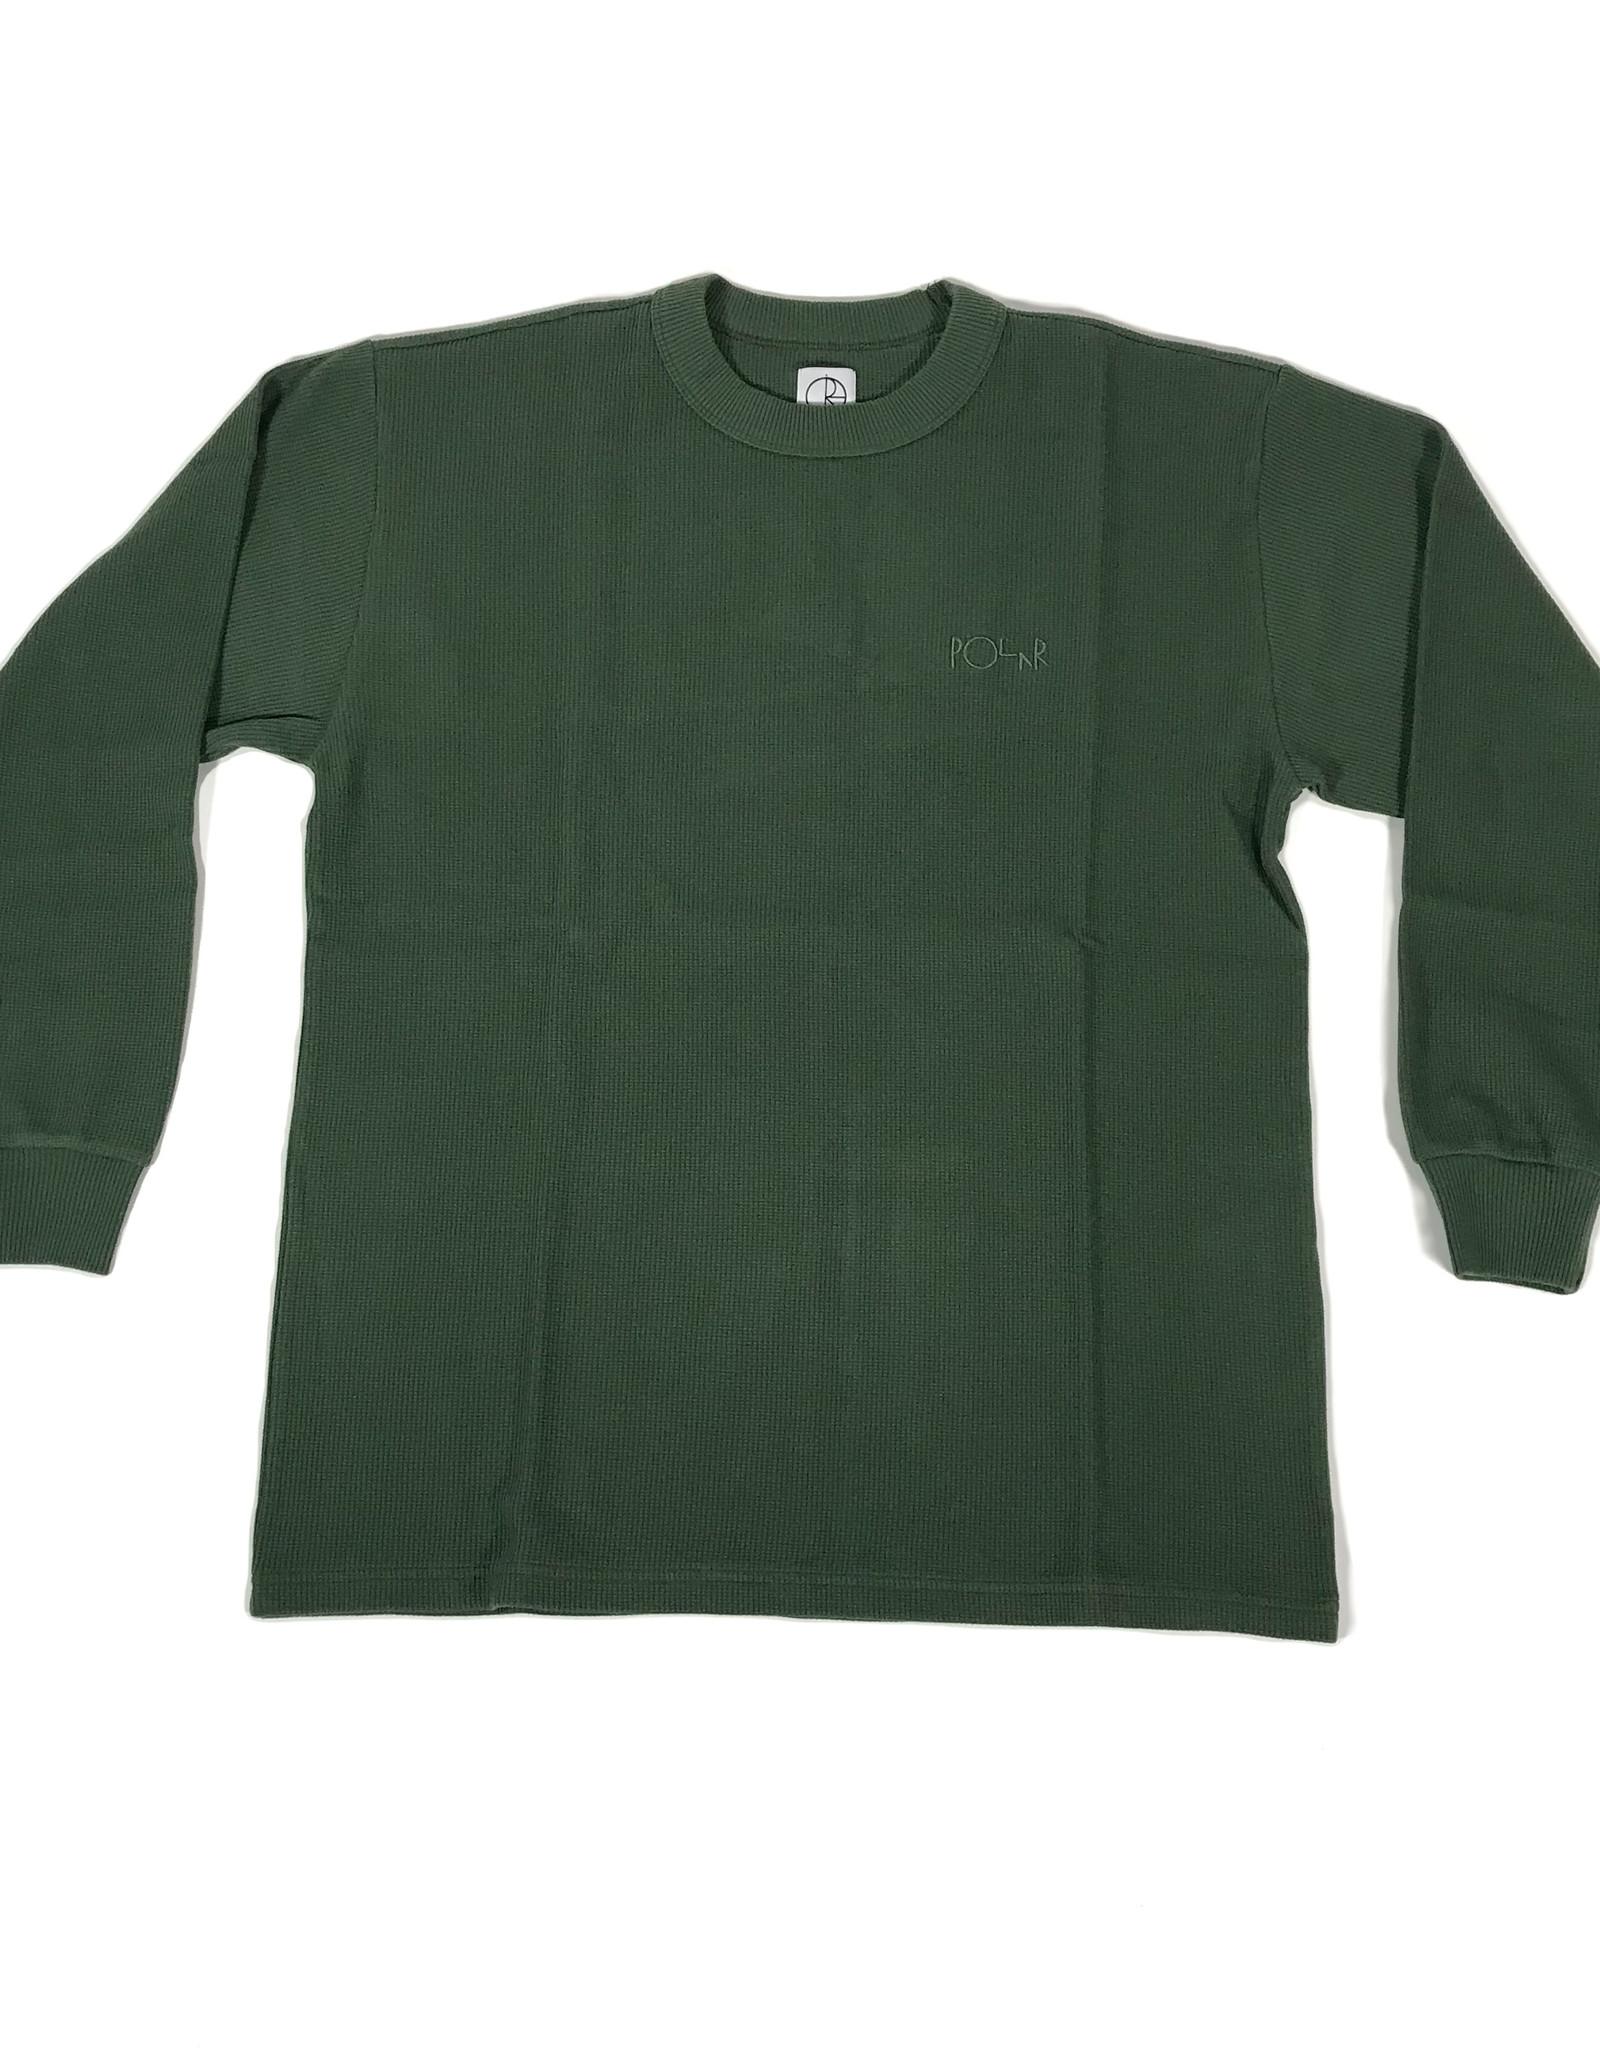 POLAR SHIN L/S THERMAL TEE - HUNTER GREEN